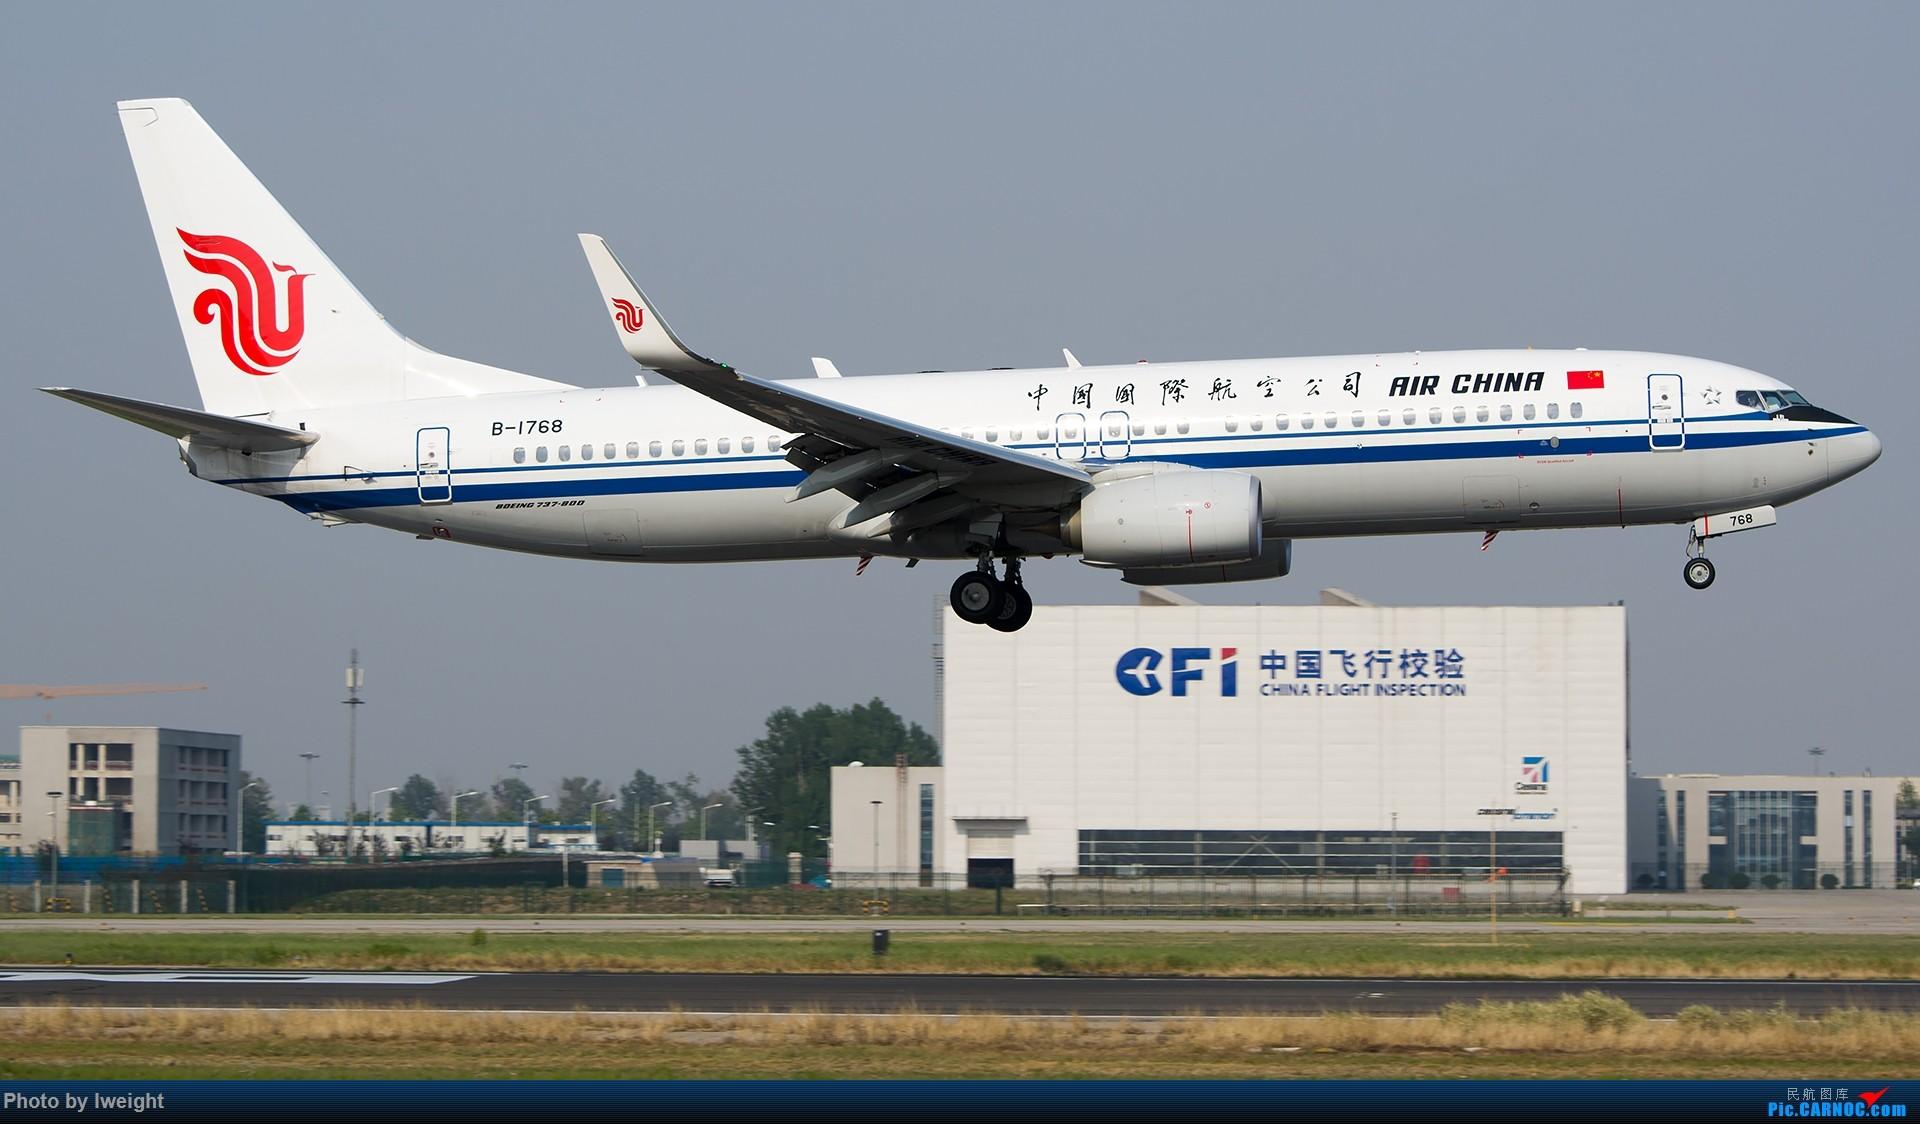 Re:[原创]周末帝都霾天拍机,凑合看看吧【2015-5-23】 BOEING 737-800 B-1768 中国北京首都国际机场